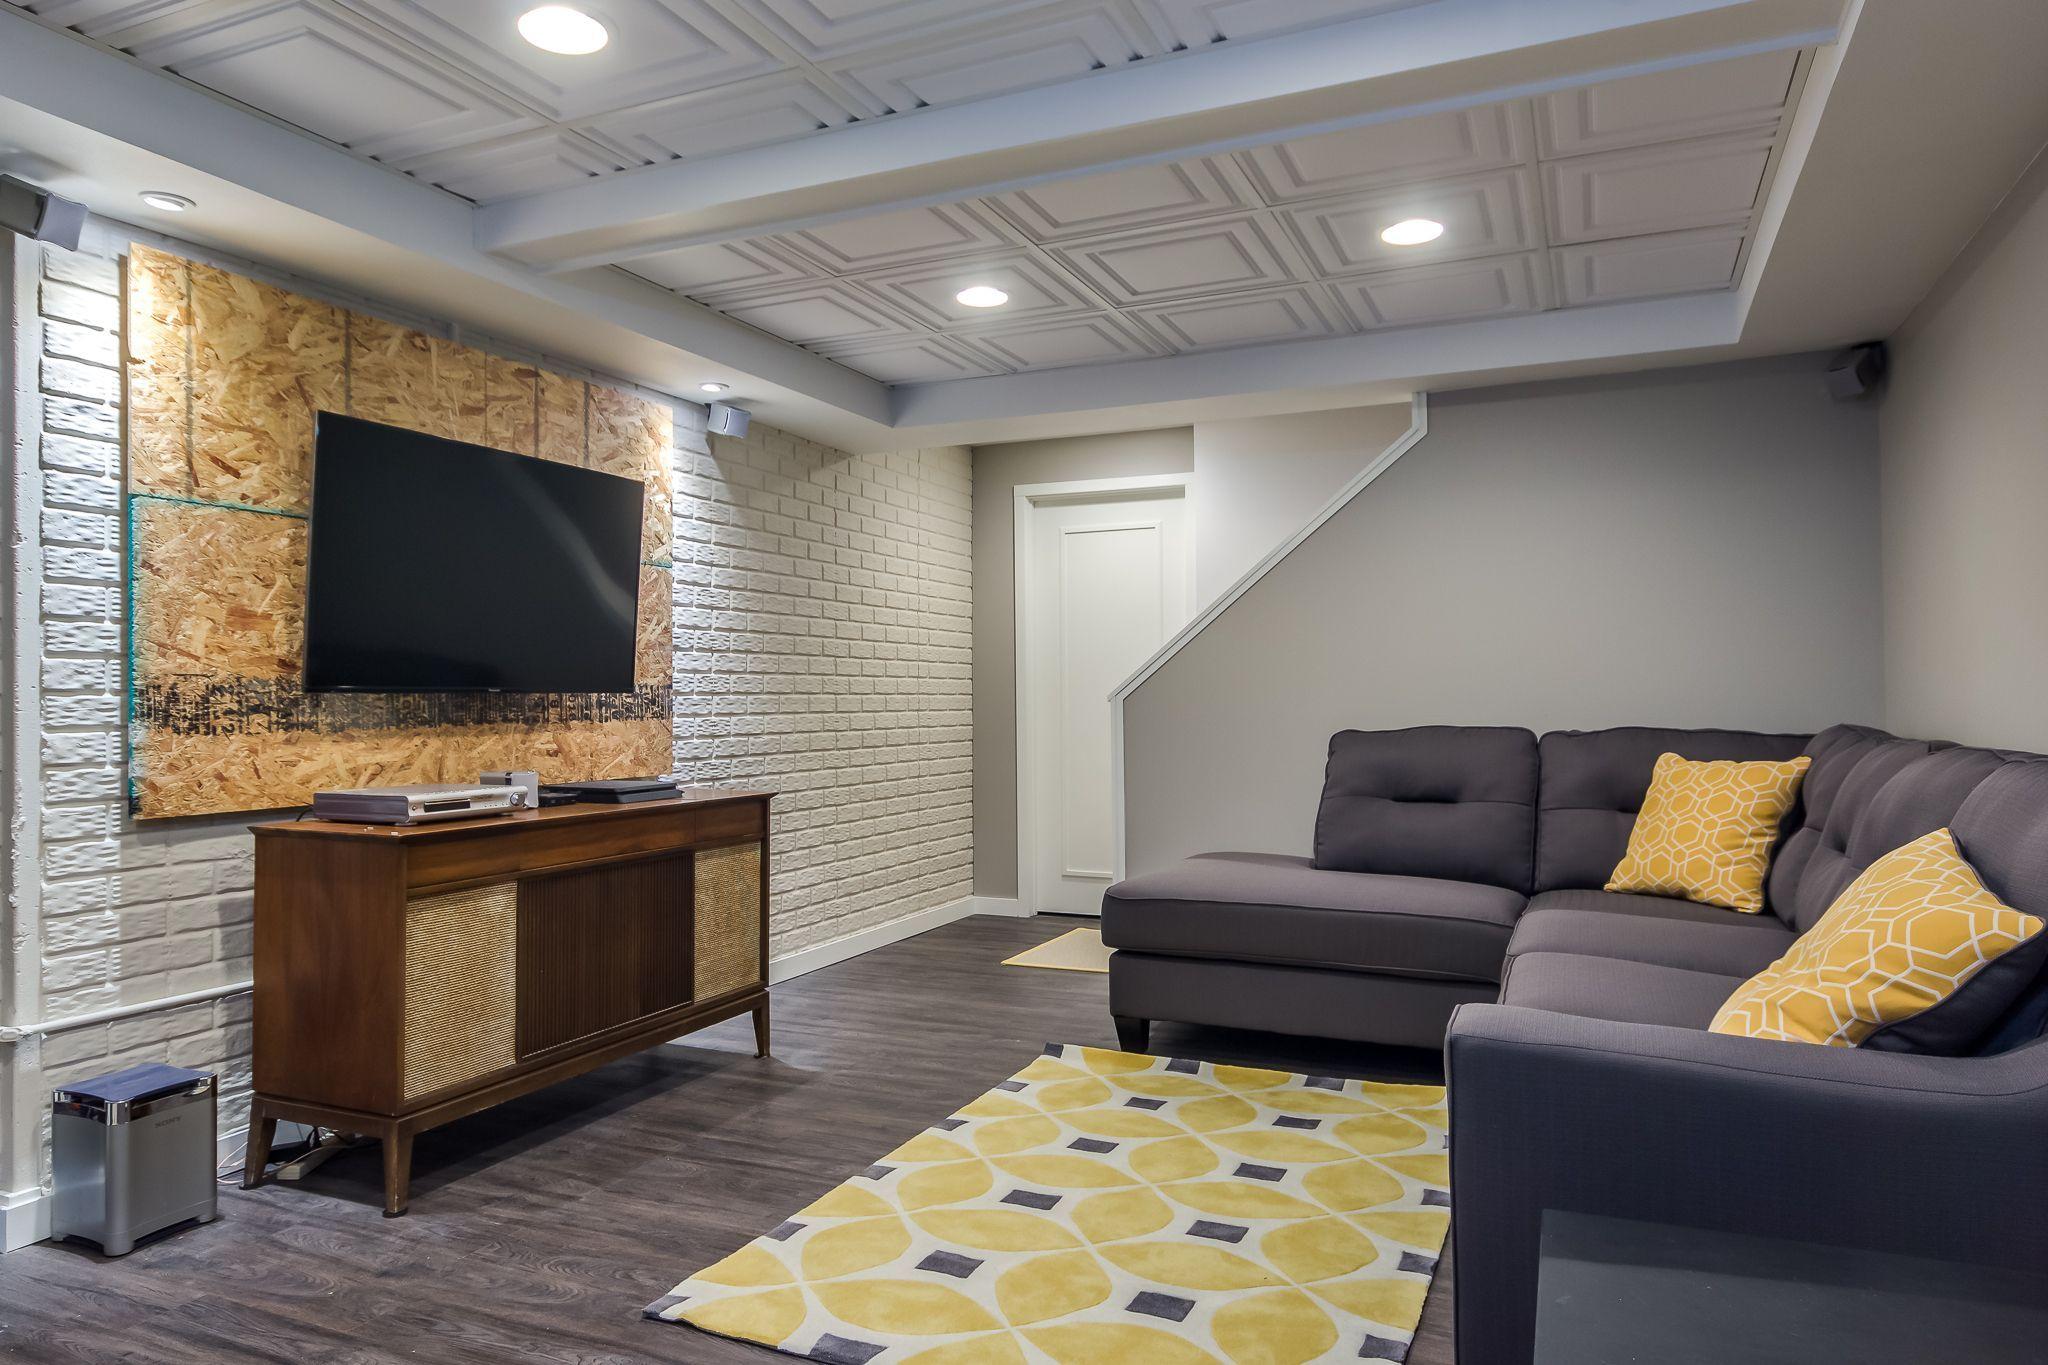 ceiling tiles basement